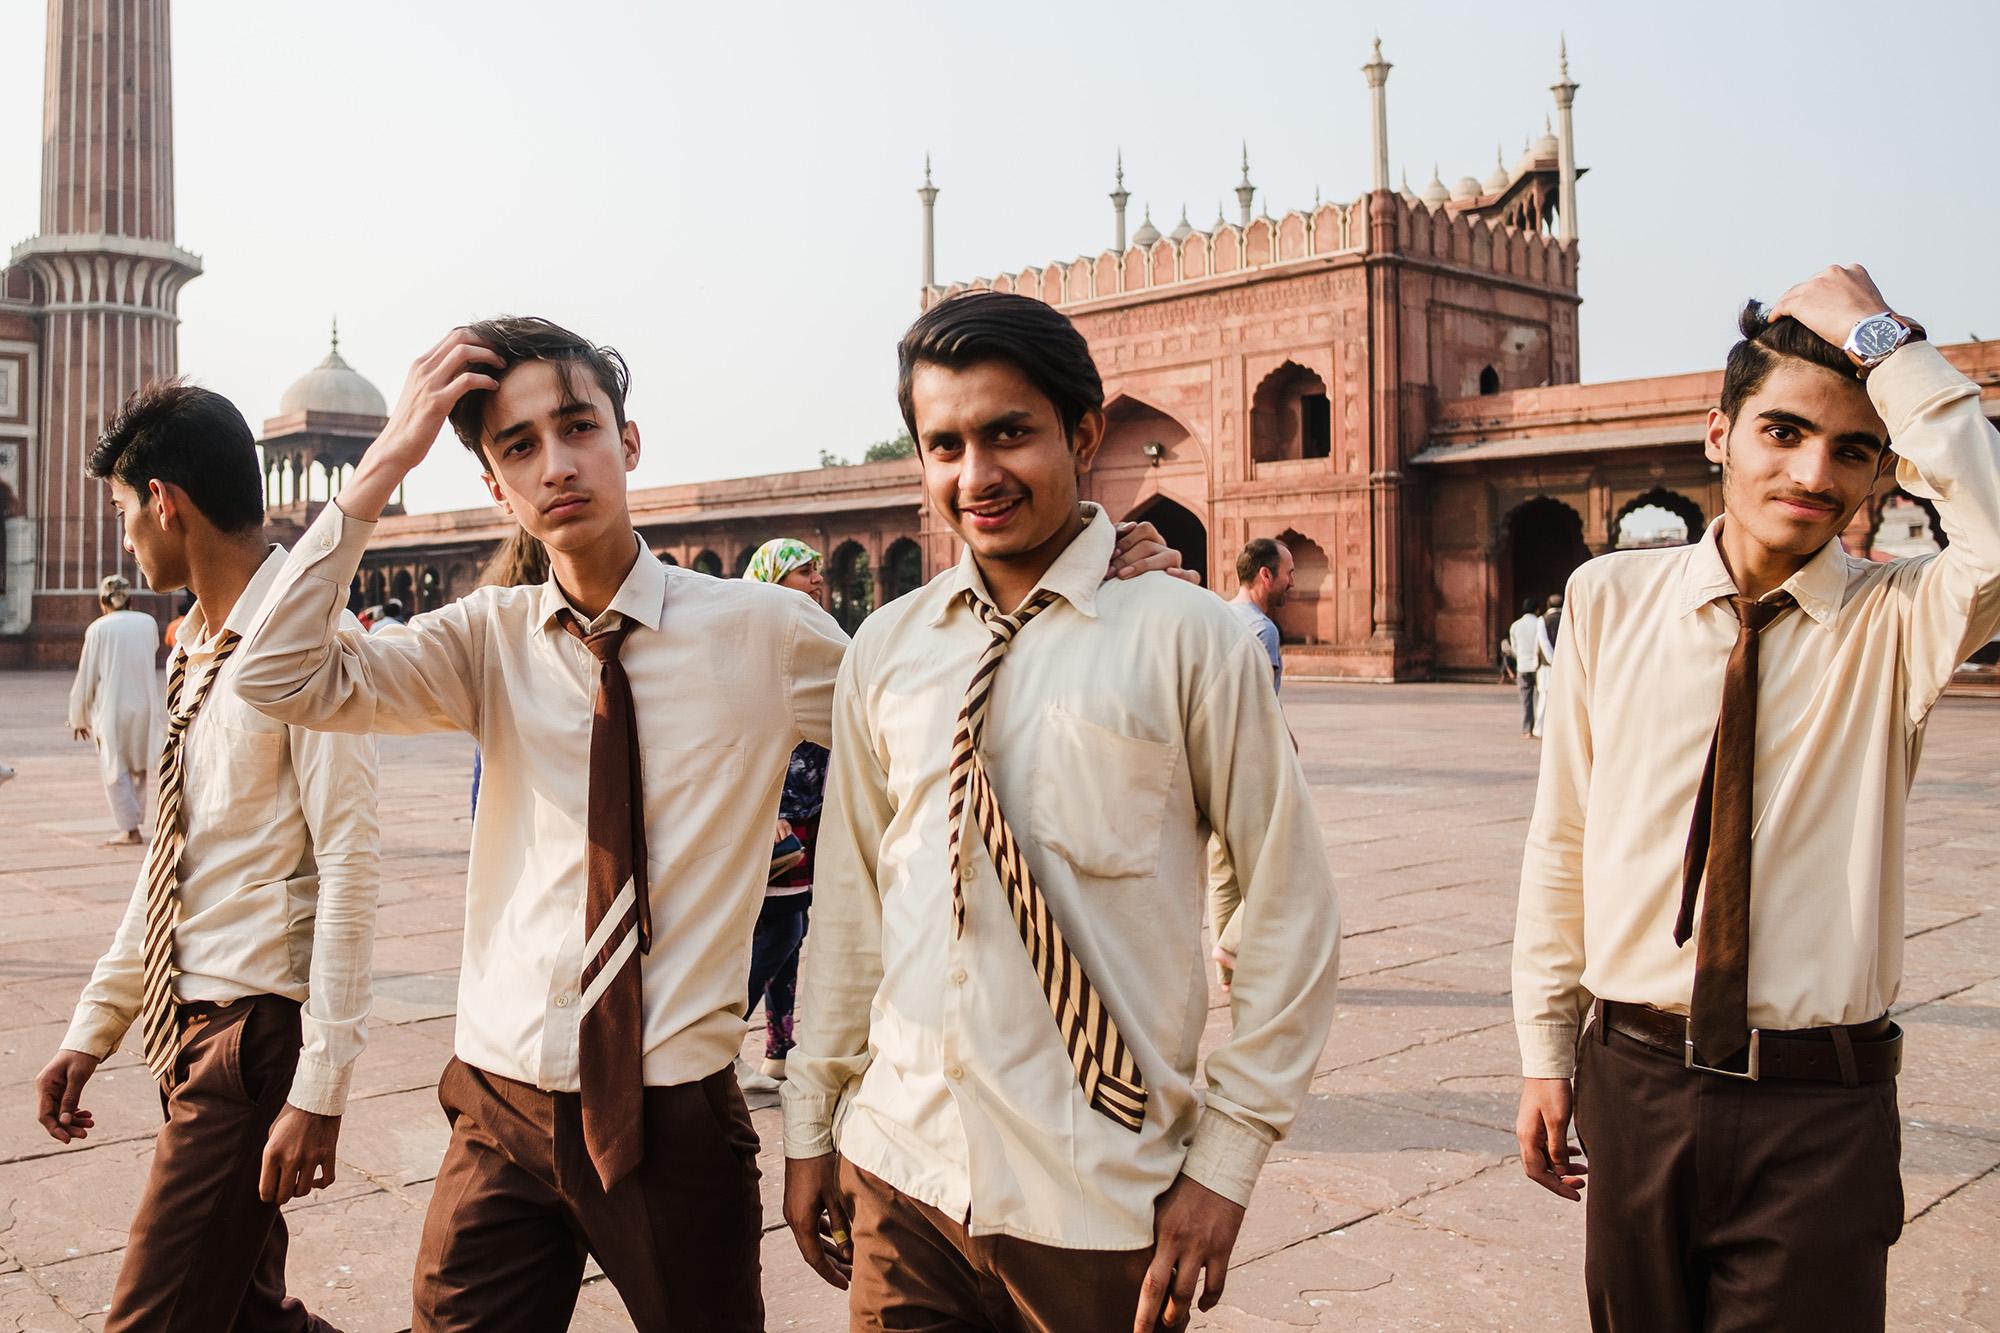 AnjaPoehlmann_India-Delhi_007.jpg